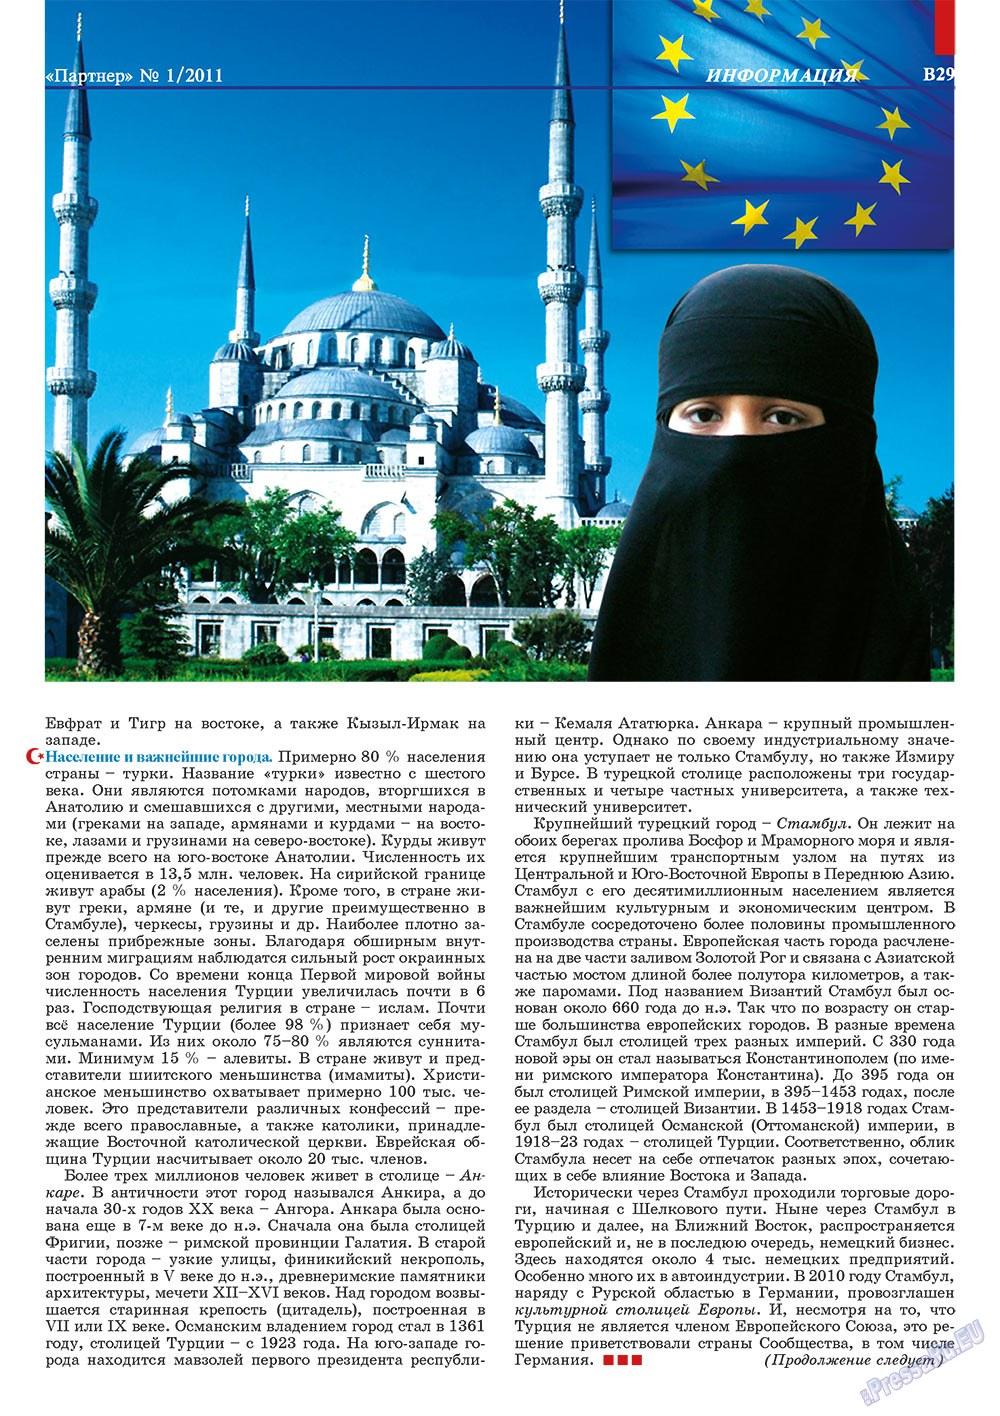 Партнер-север (журнал). 2011 год, номер 1, стр. 39